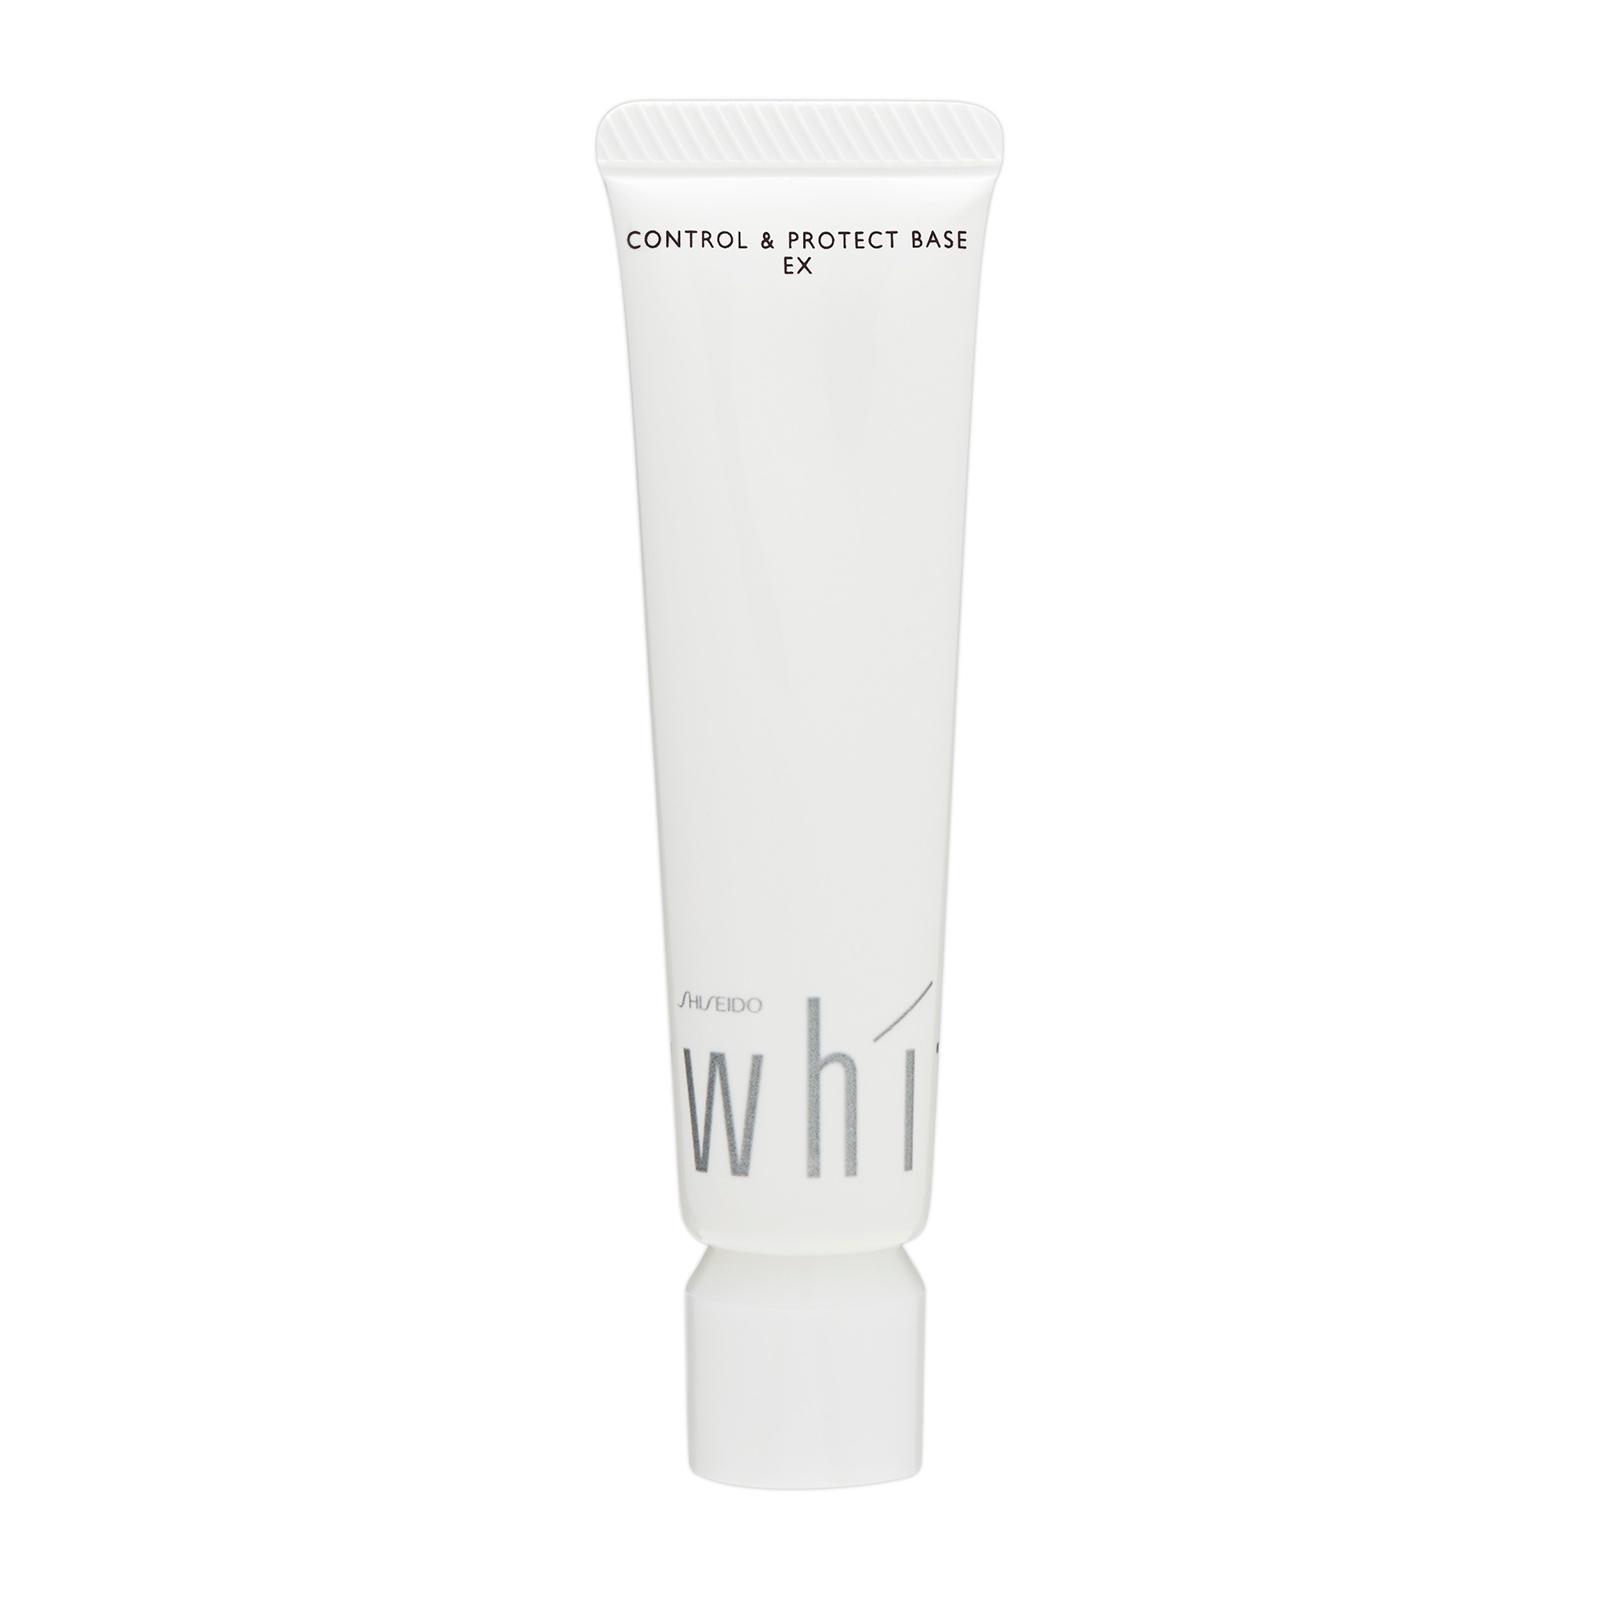 Shiseido UV White  Control & Protect Base EX SPF25 / PA++ Ivory 象牙色, 25g,